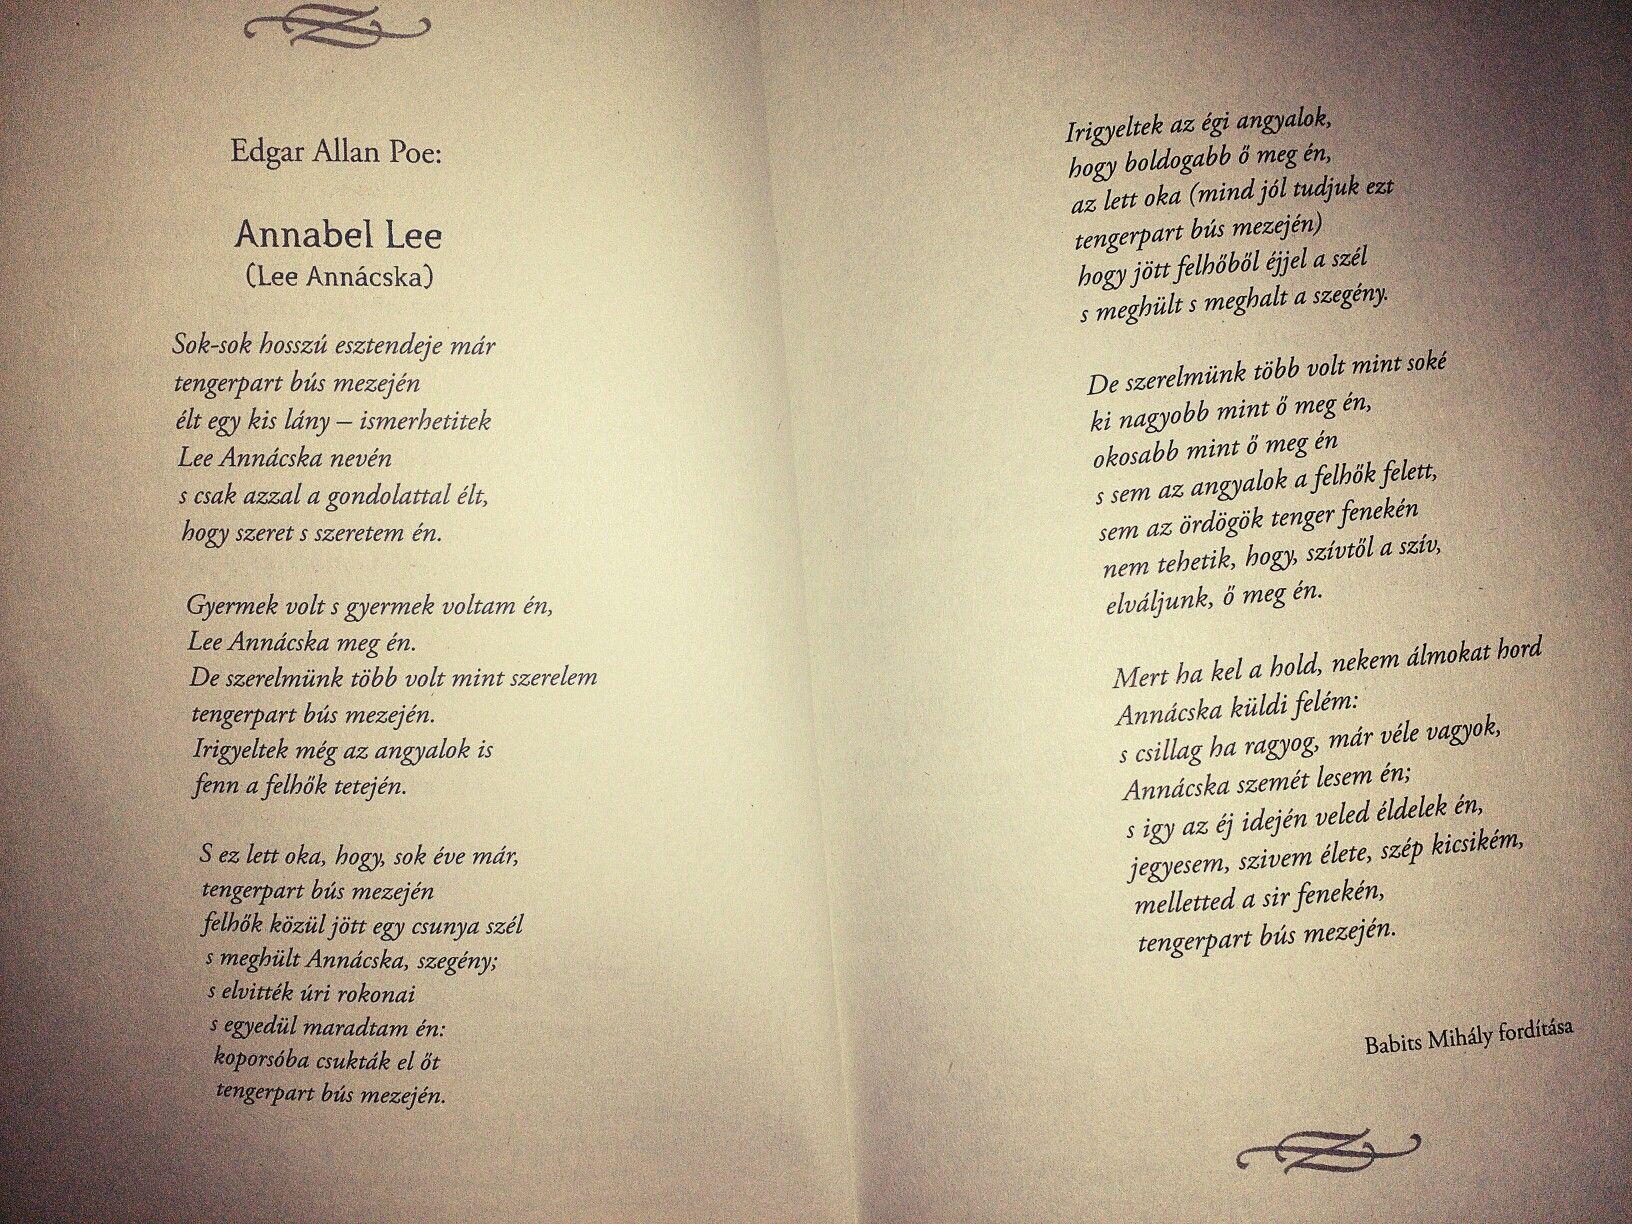 edgar allen poe comparative essay Death in the poetry of edgar allan poe english literature essay berkhan çinar tekdemi̇r engl 10203 the recurring theme of death in the poetry of edgar allan poe.